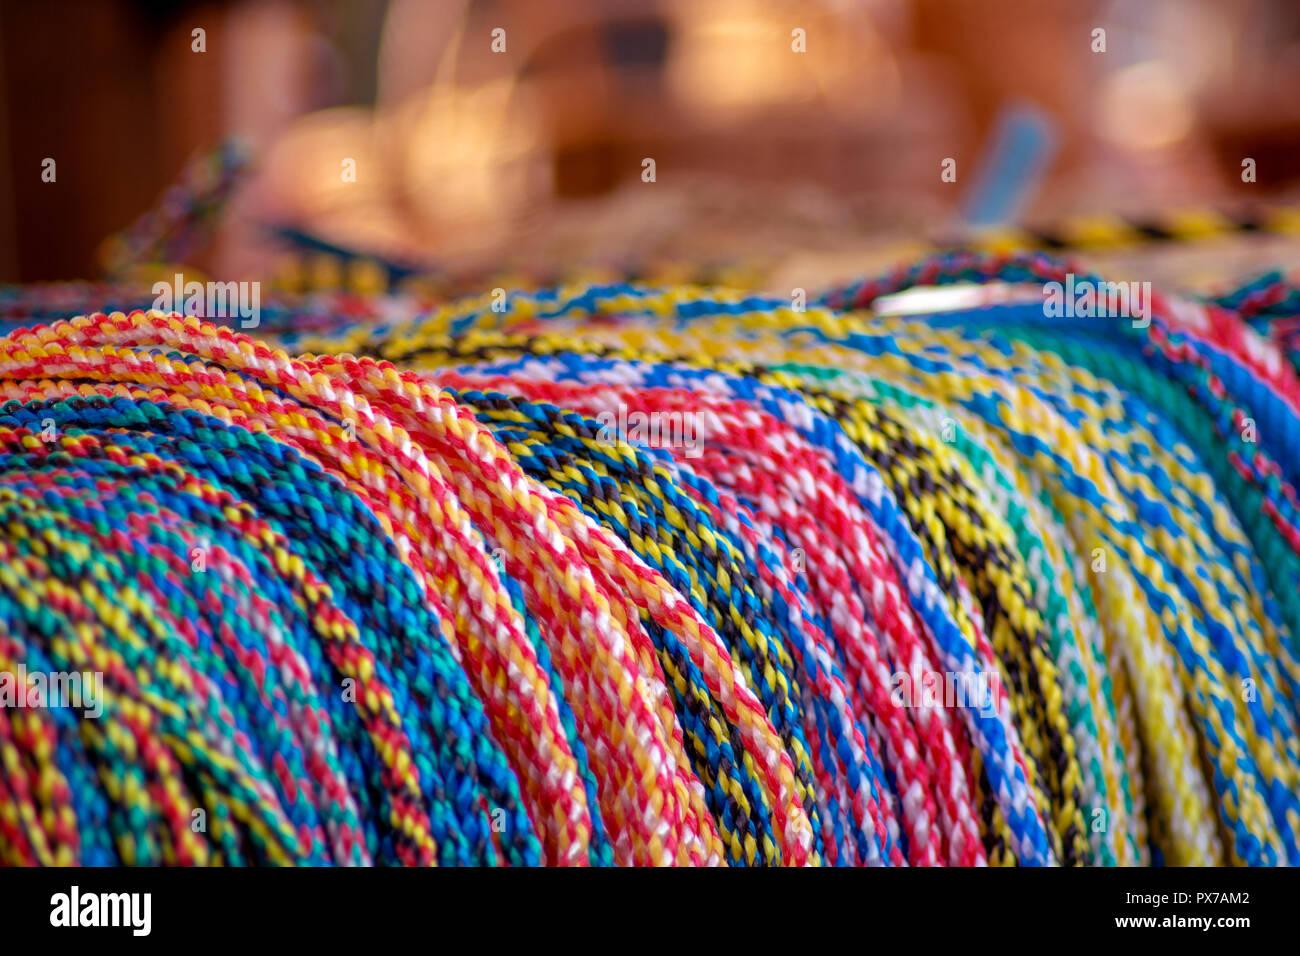 Concept Kaltblutmarkt 2018 : Ropes - Stock Image